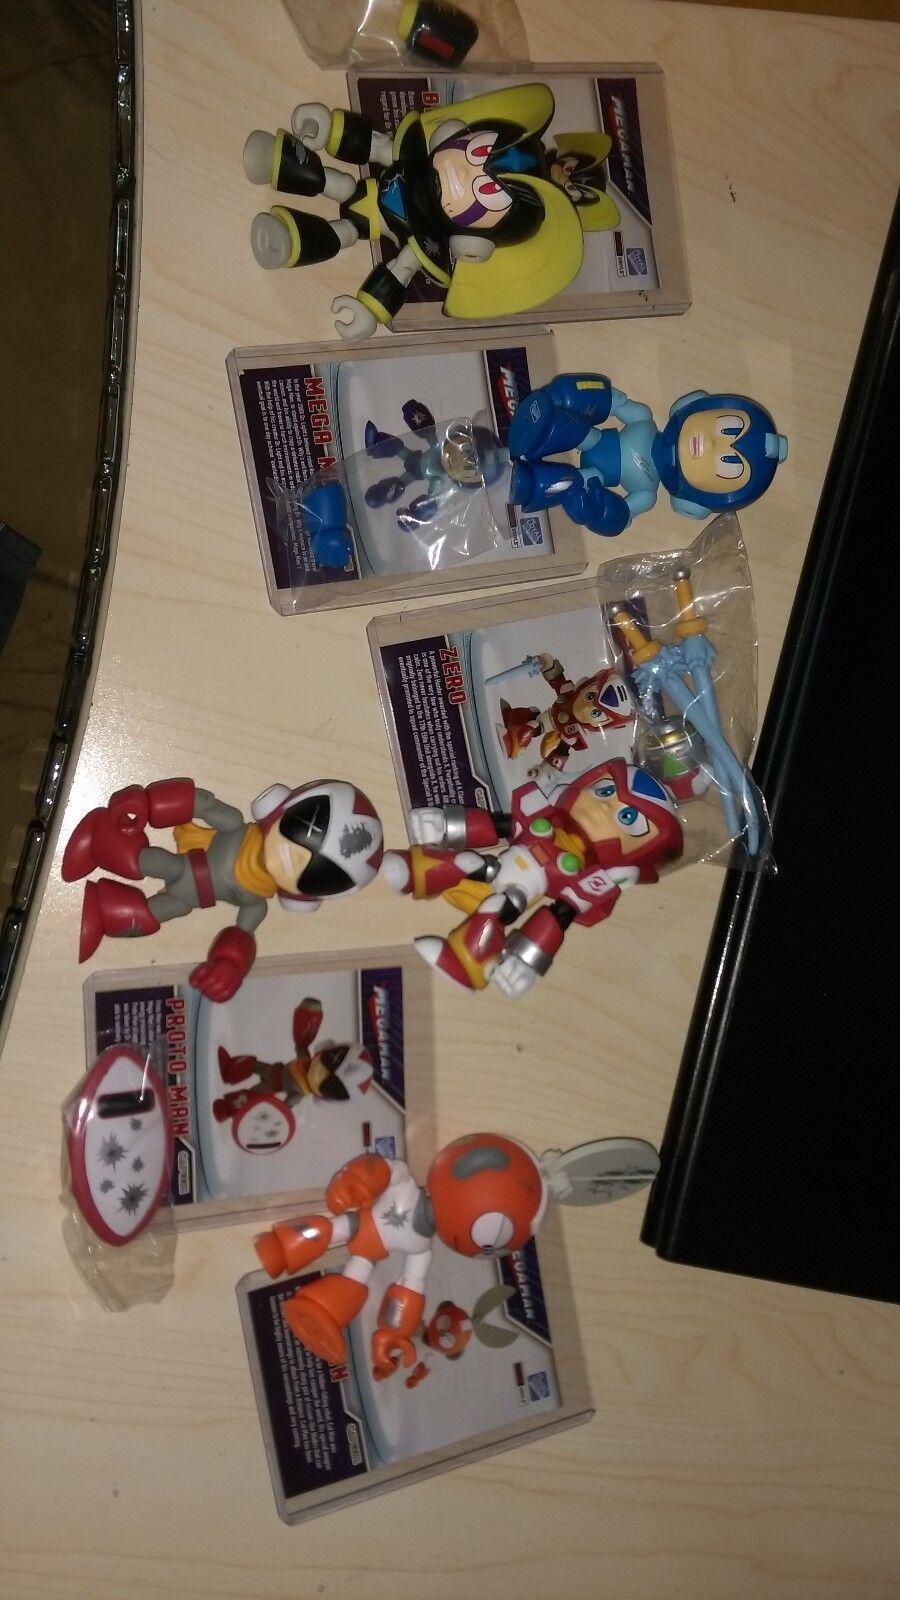 The Loyal Subjects Mega Man Battle Damage Walmart Set of 6